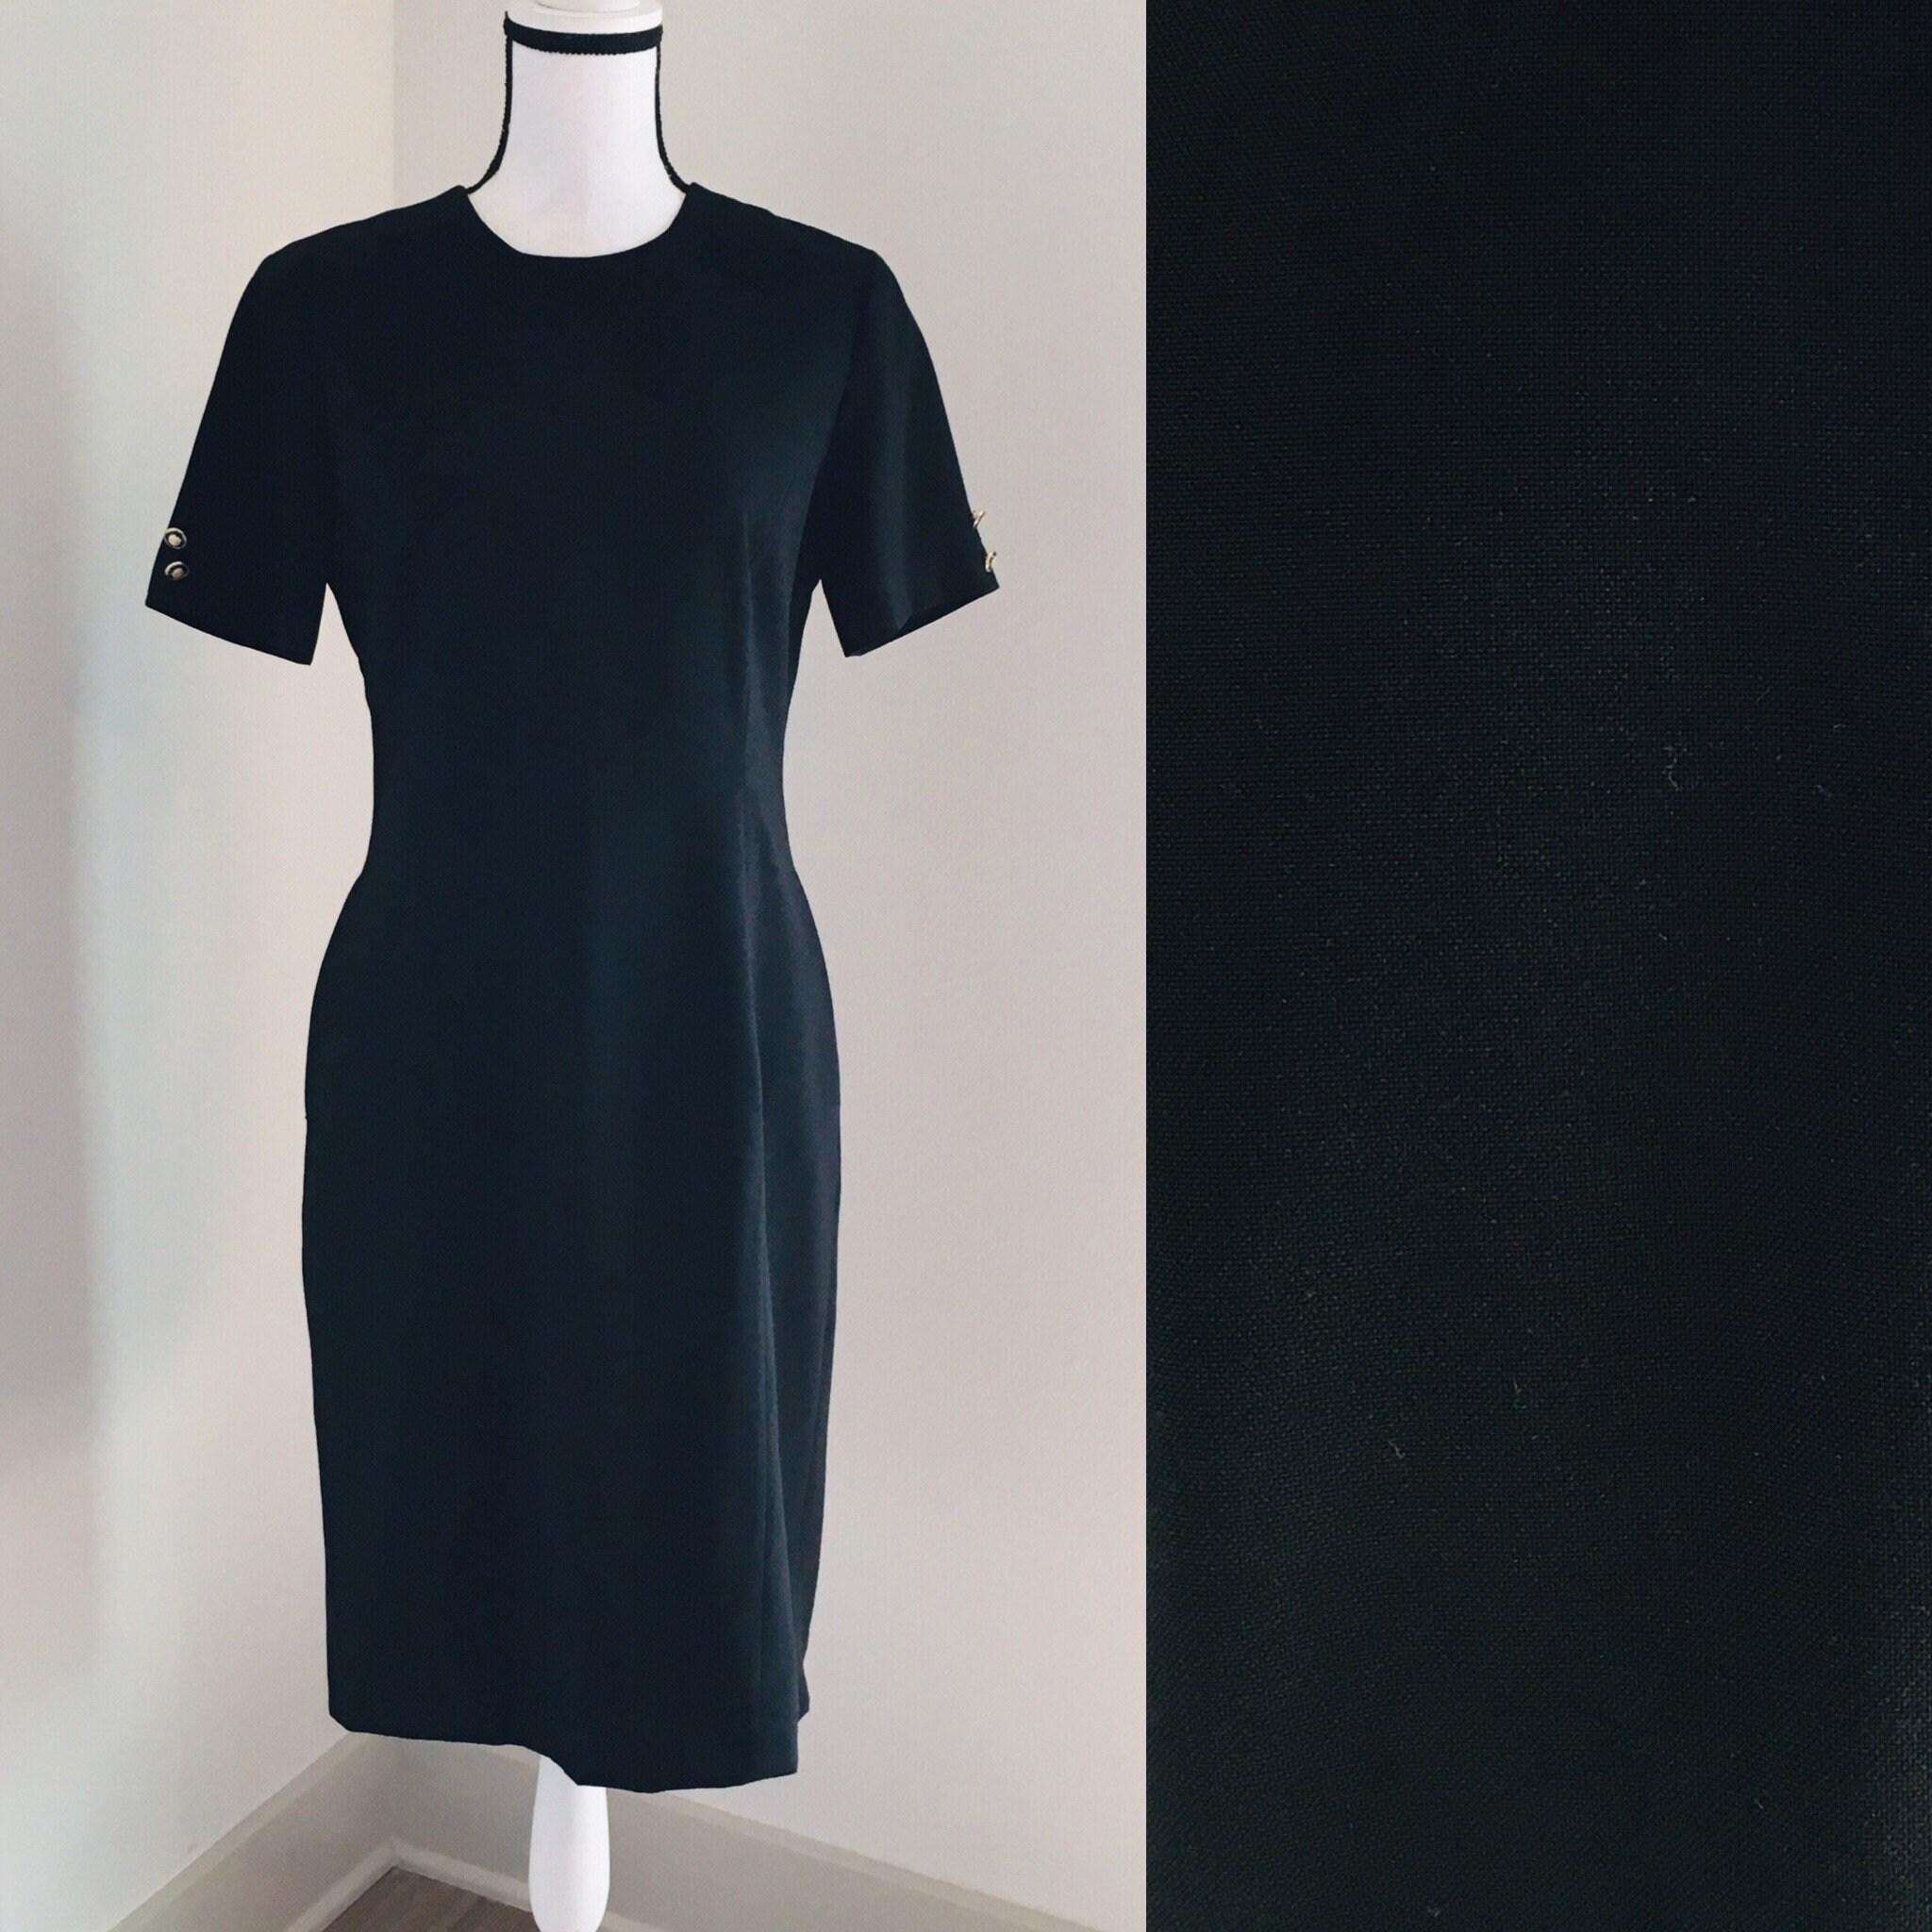 80s Dresses   Casual to Party Dresses Vintage Uty, 1980S Black Dress, Vintage Little Short Sleeve Dress, 1980S Simple Wool Classic Dress $25.00 AT vintagedancer.com